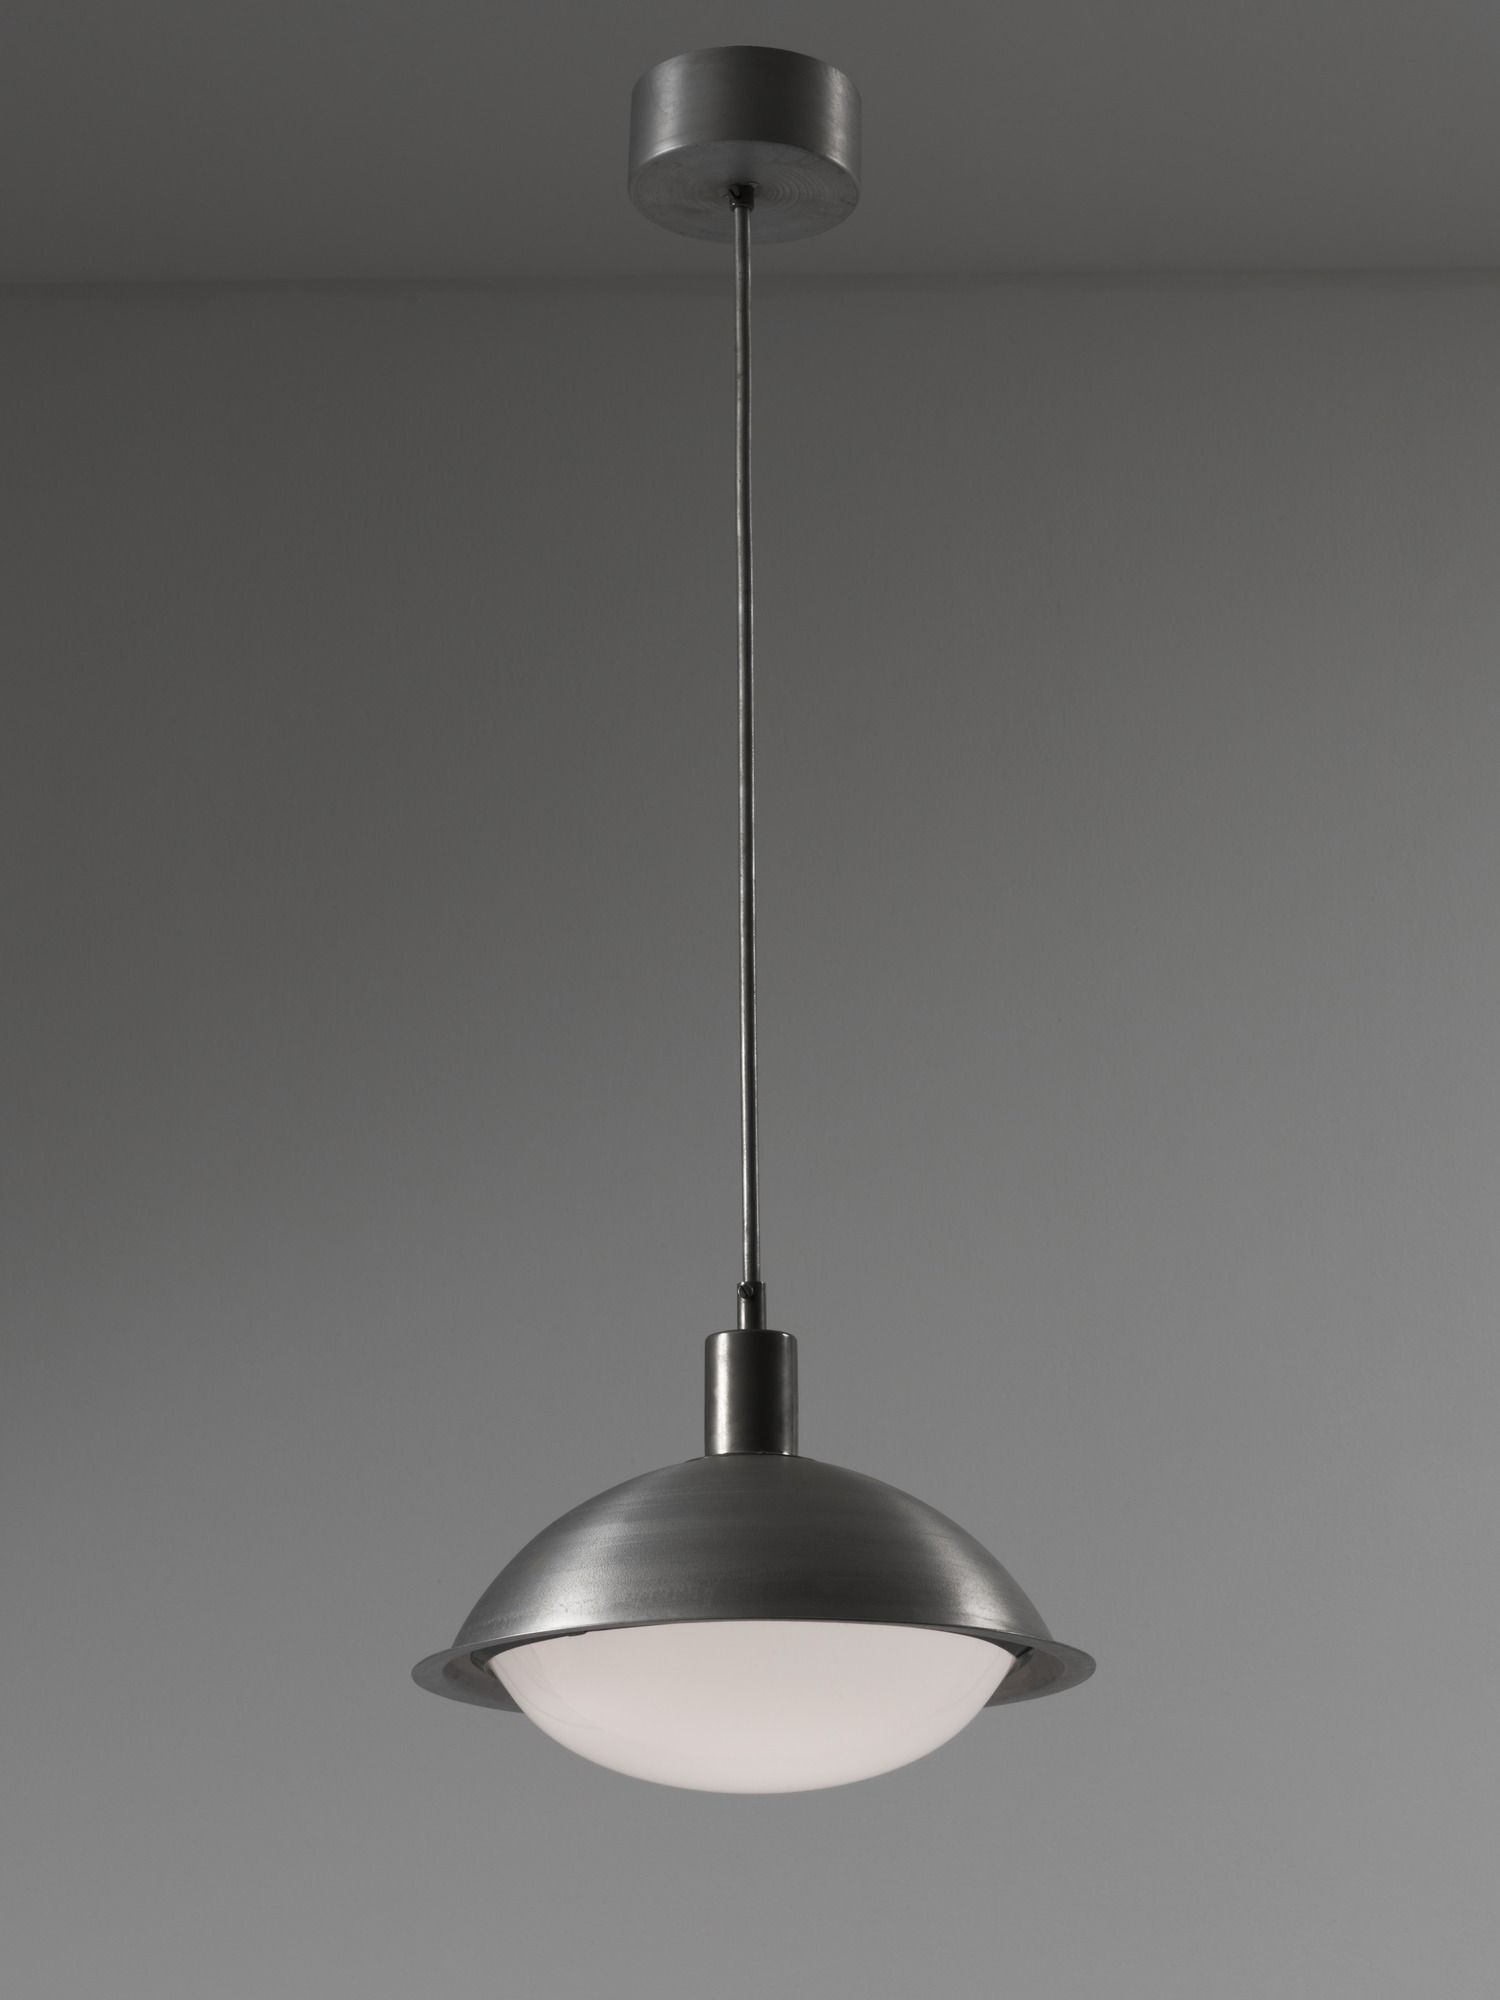 The School of Bauhaus/ Marianne Brandt Ceiling Lamp 1925